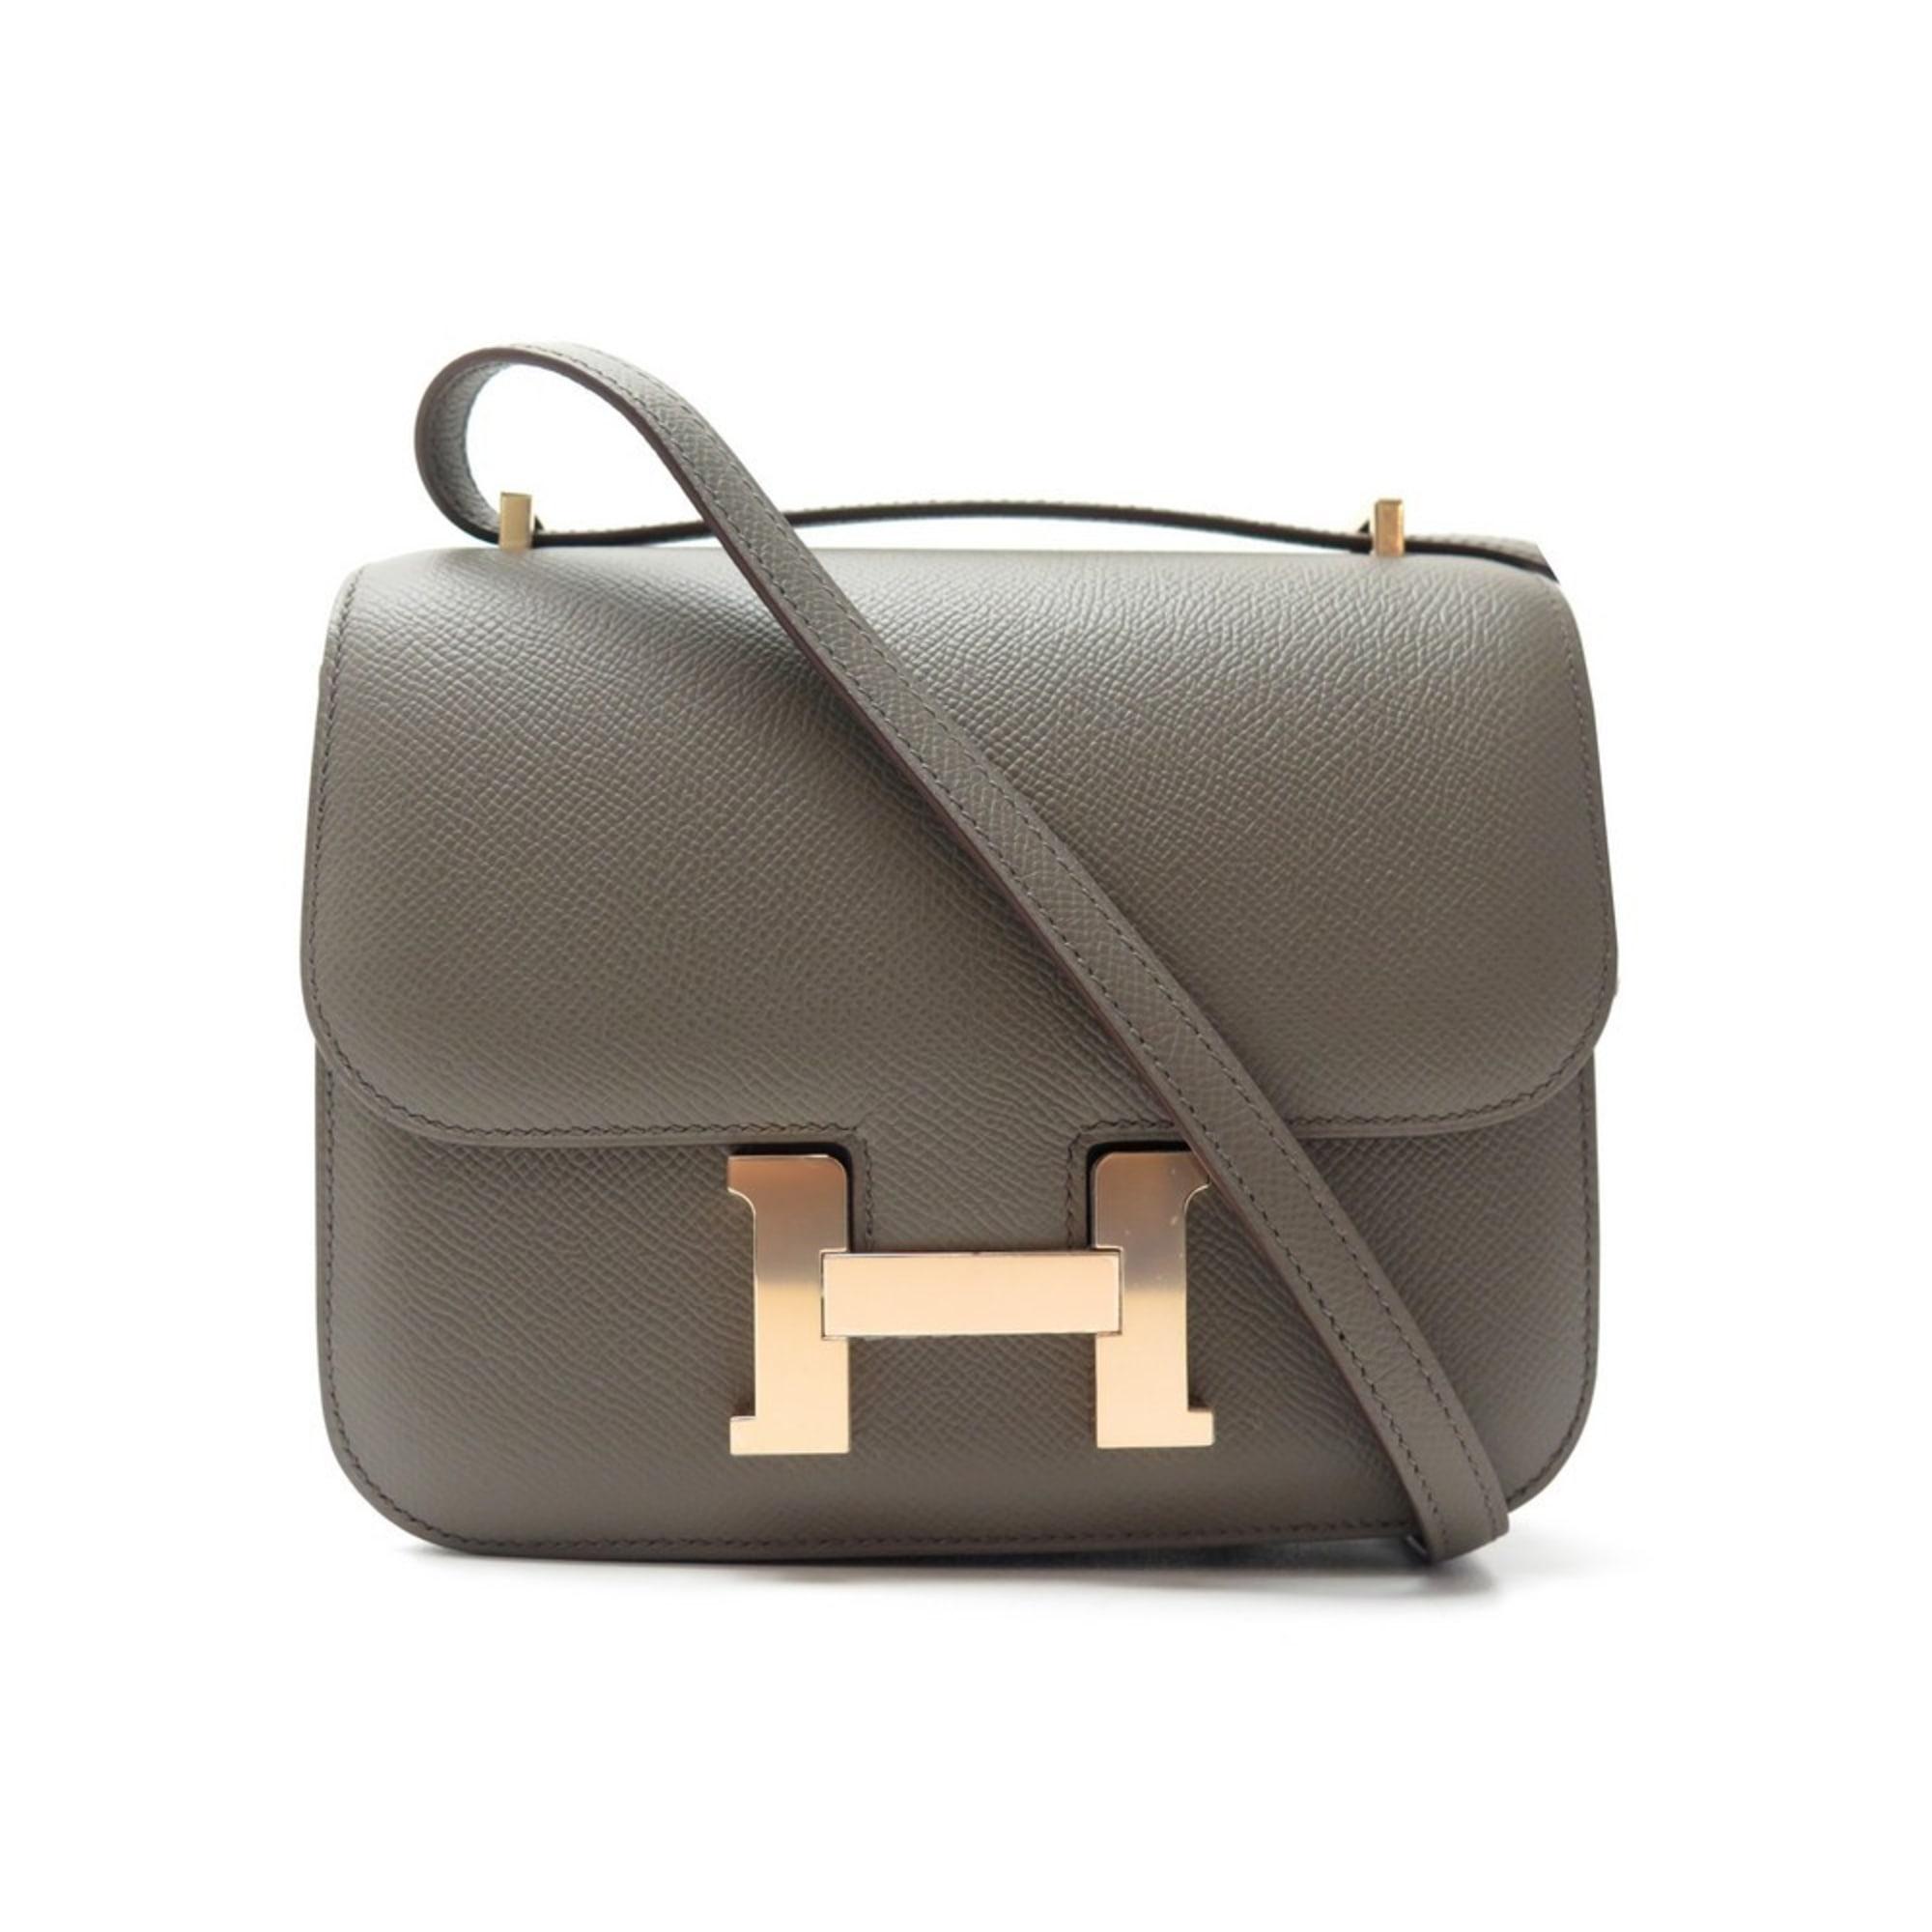 Lederhandtasche HERMÈS Constance taupe